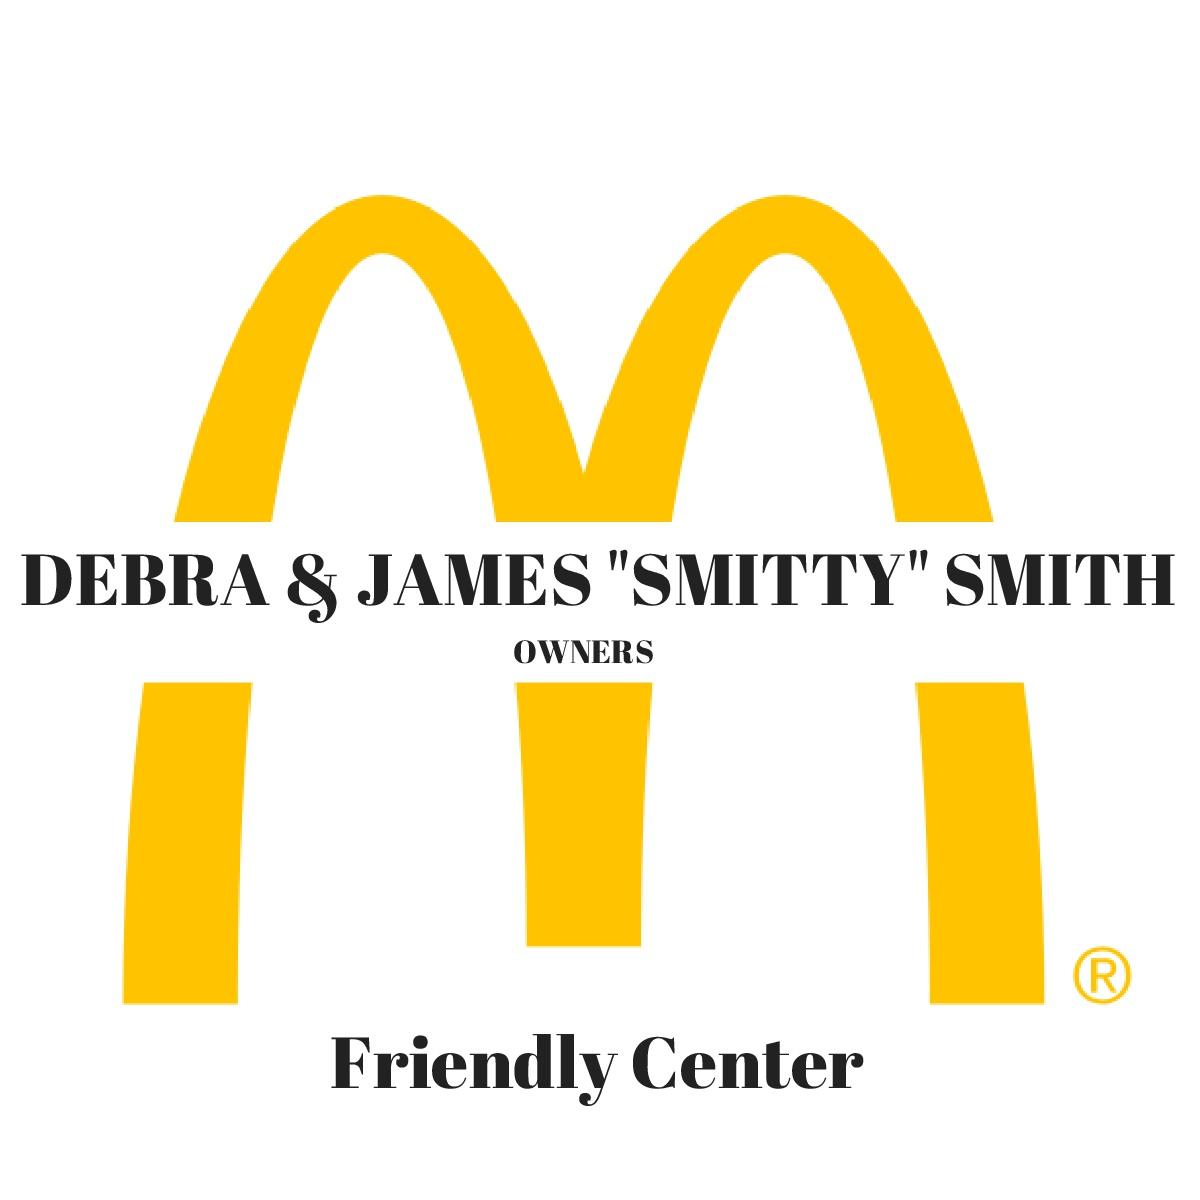 DEBRA & JAMES SMITTY SMITH-4-001.jpg